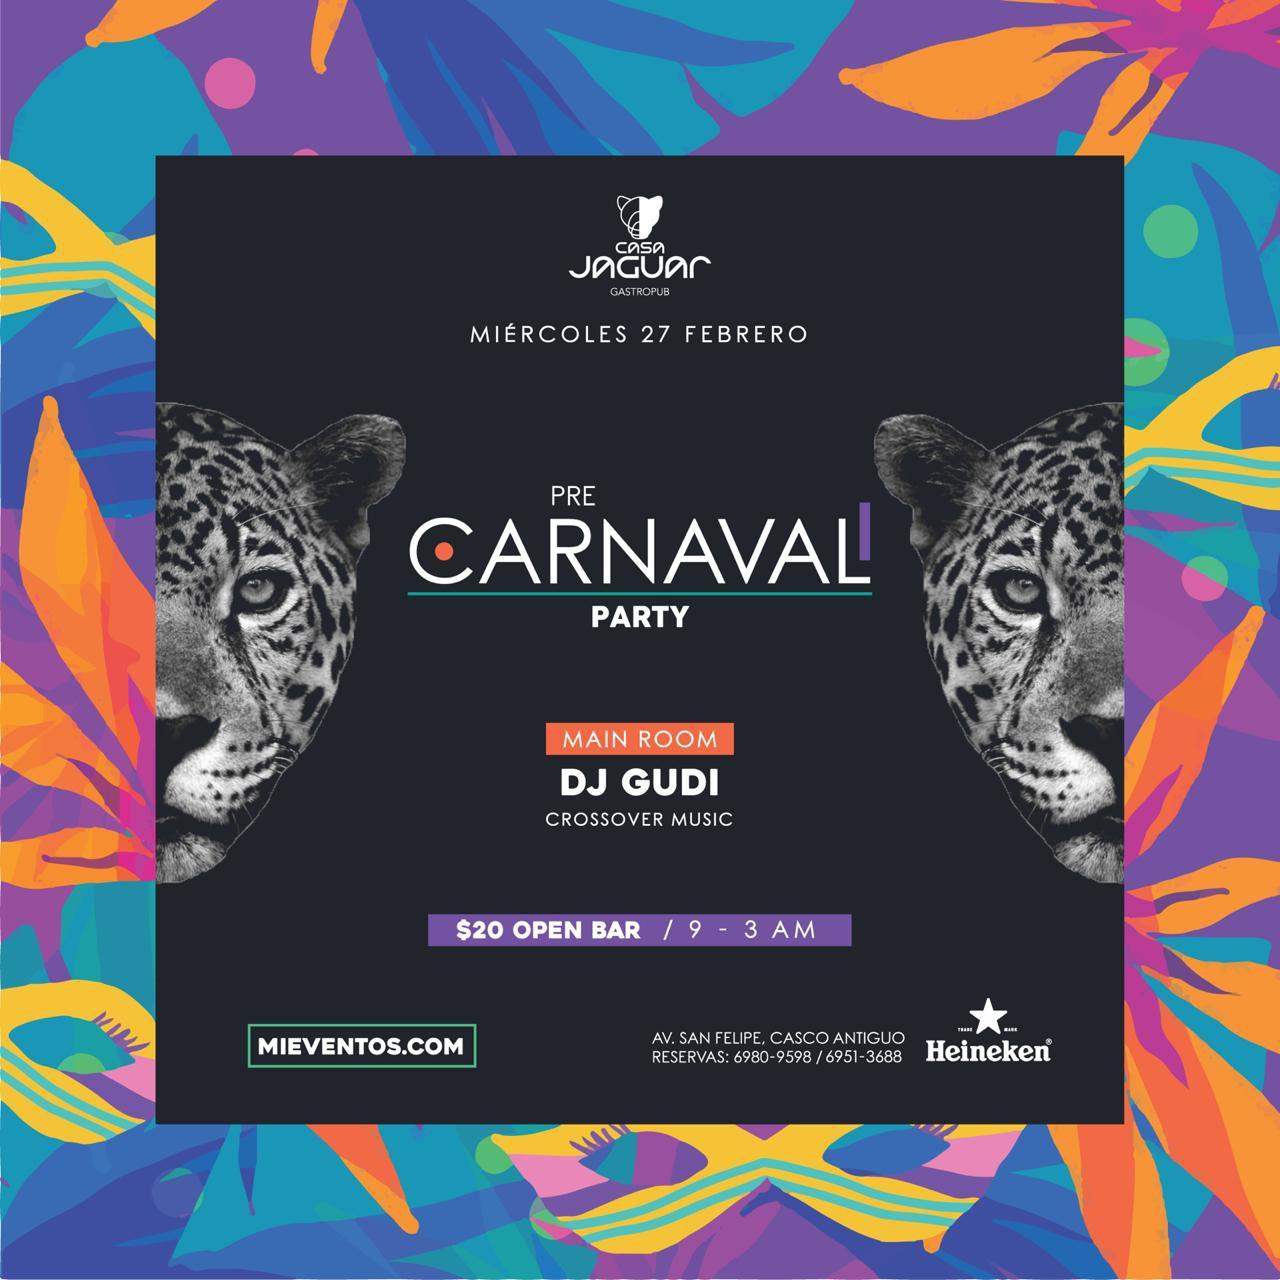 Previous Carnivals